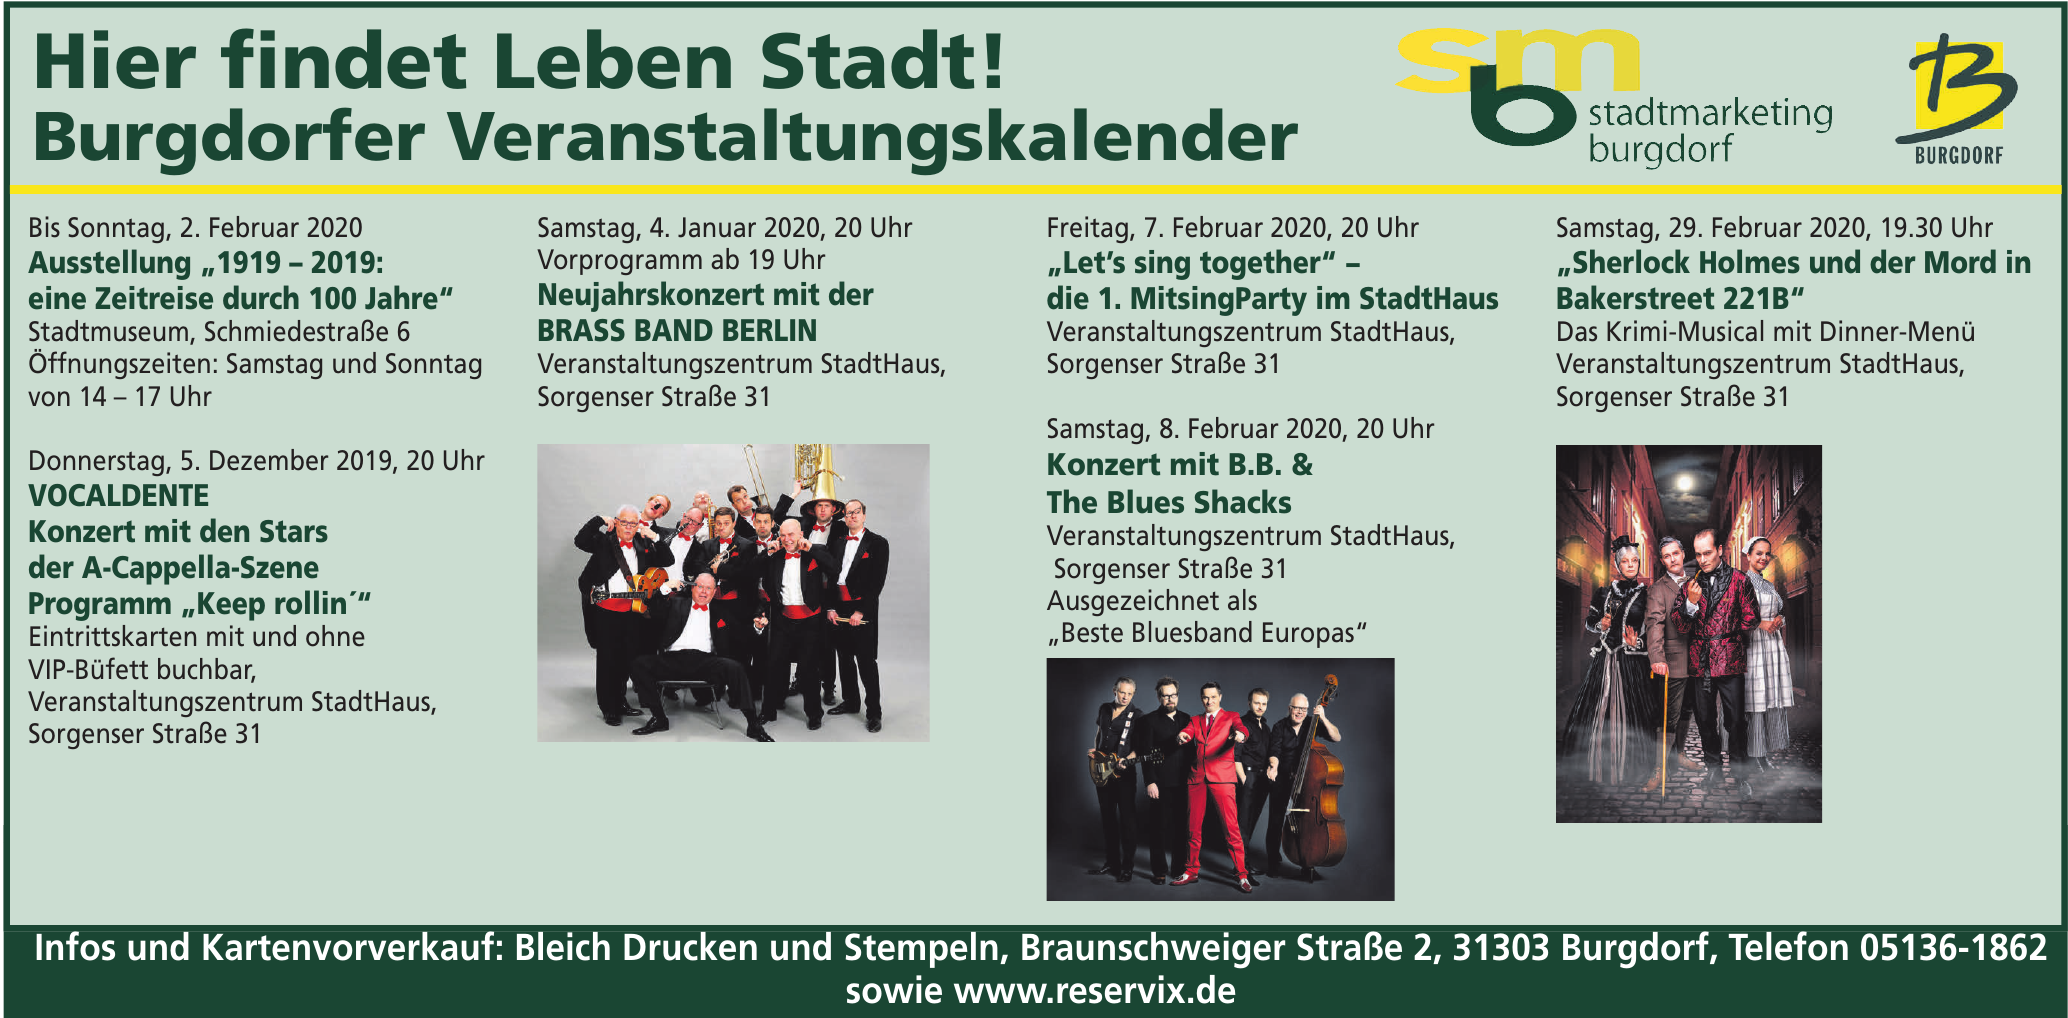 Stadtmarketing Burgdorf - Burgdorfer Veranstaltungskalender